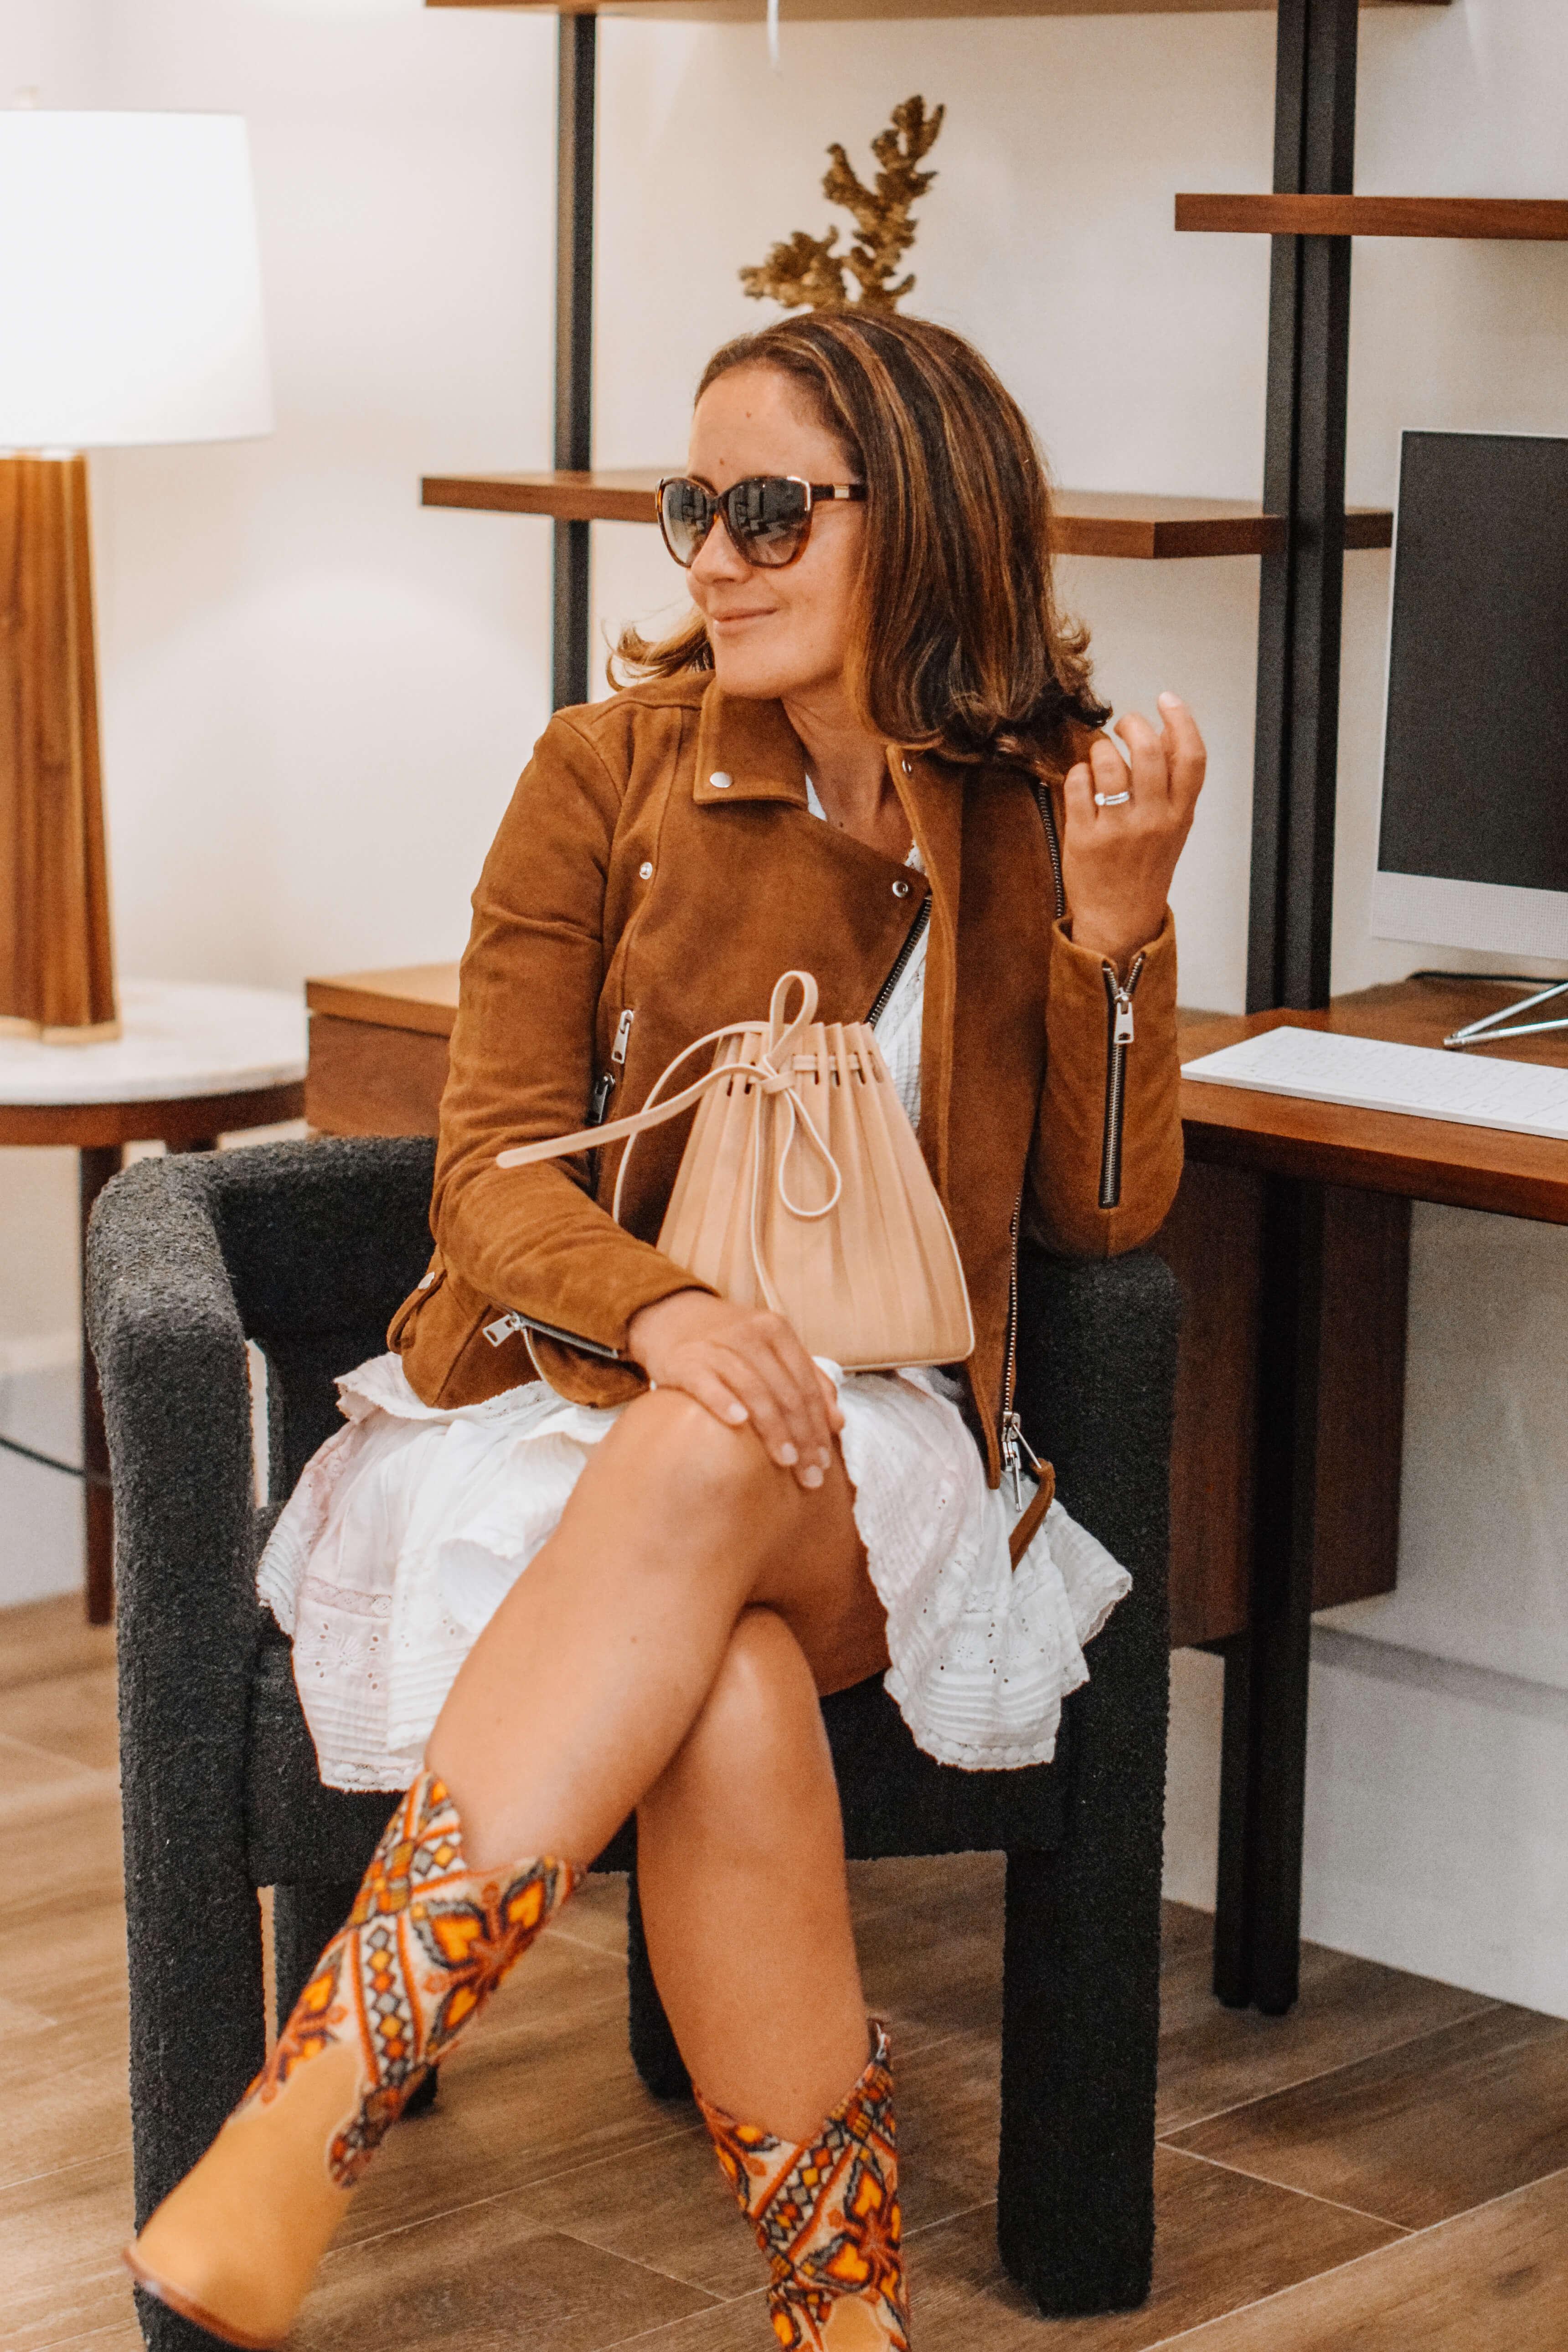 Loveshack Fancy Dress AllSaints Jacket Momo Design Anthro Boots Outfit by Modnitsa Styling